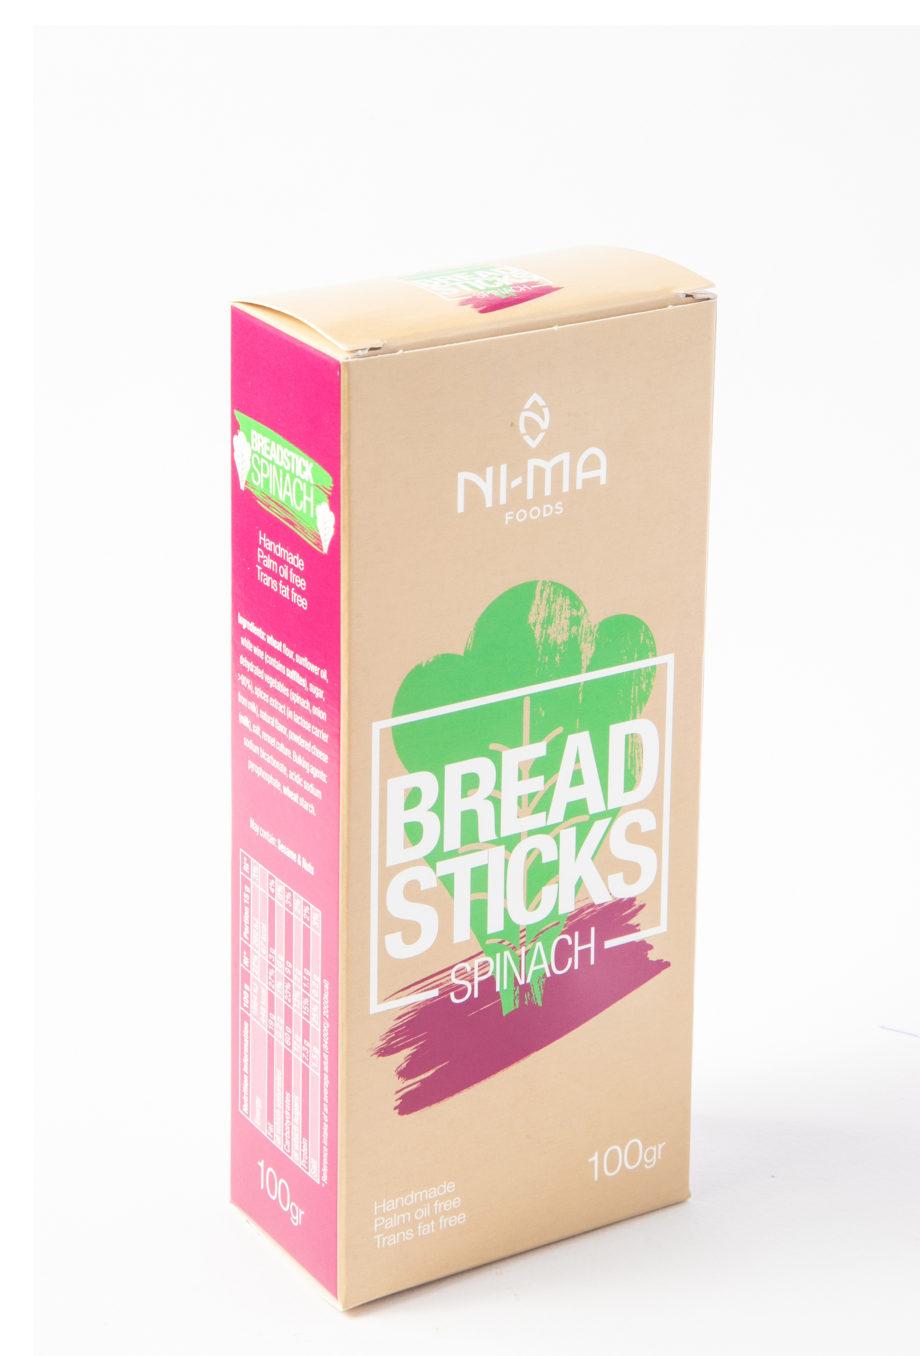 spinach breadsticks box